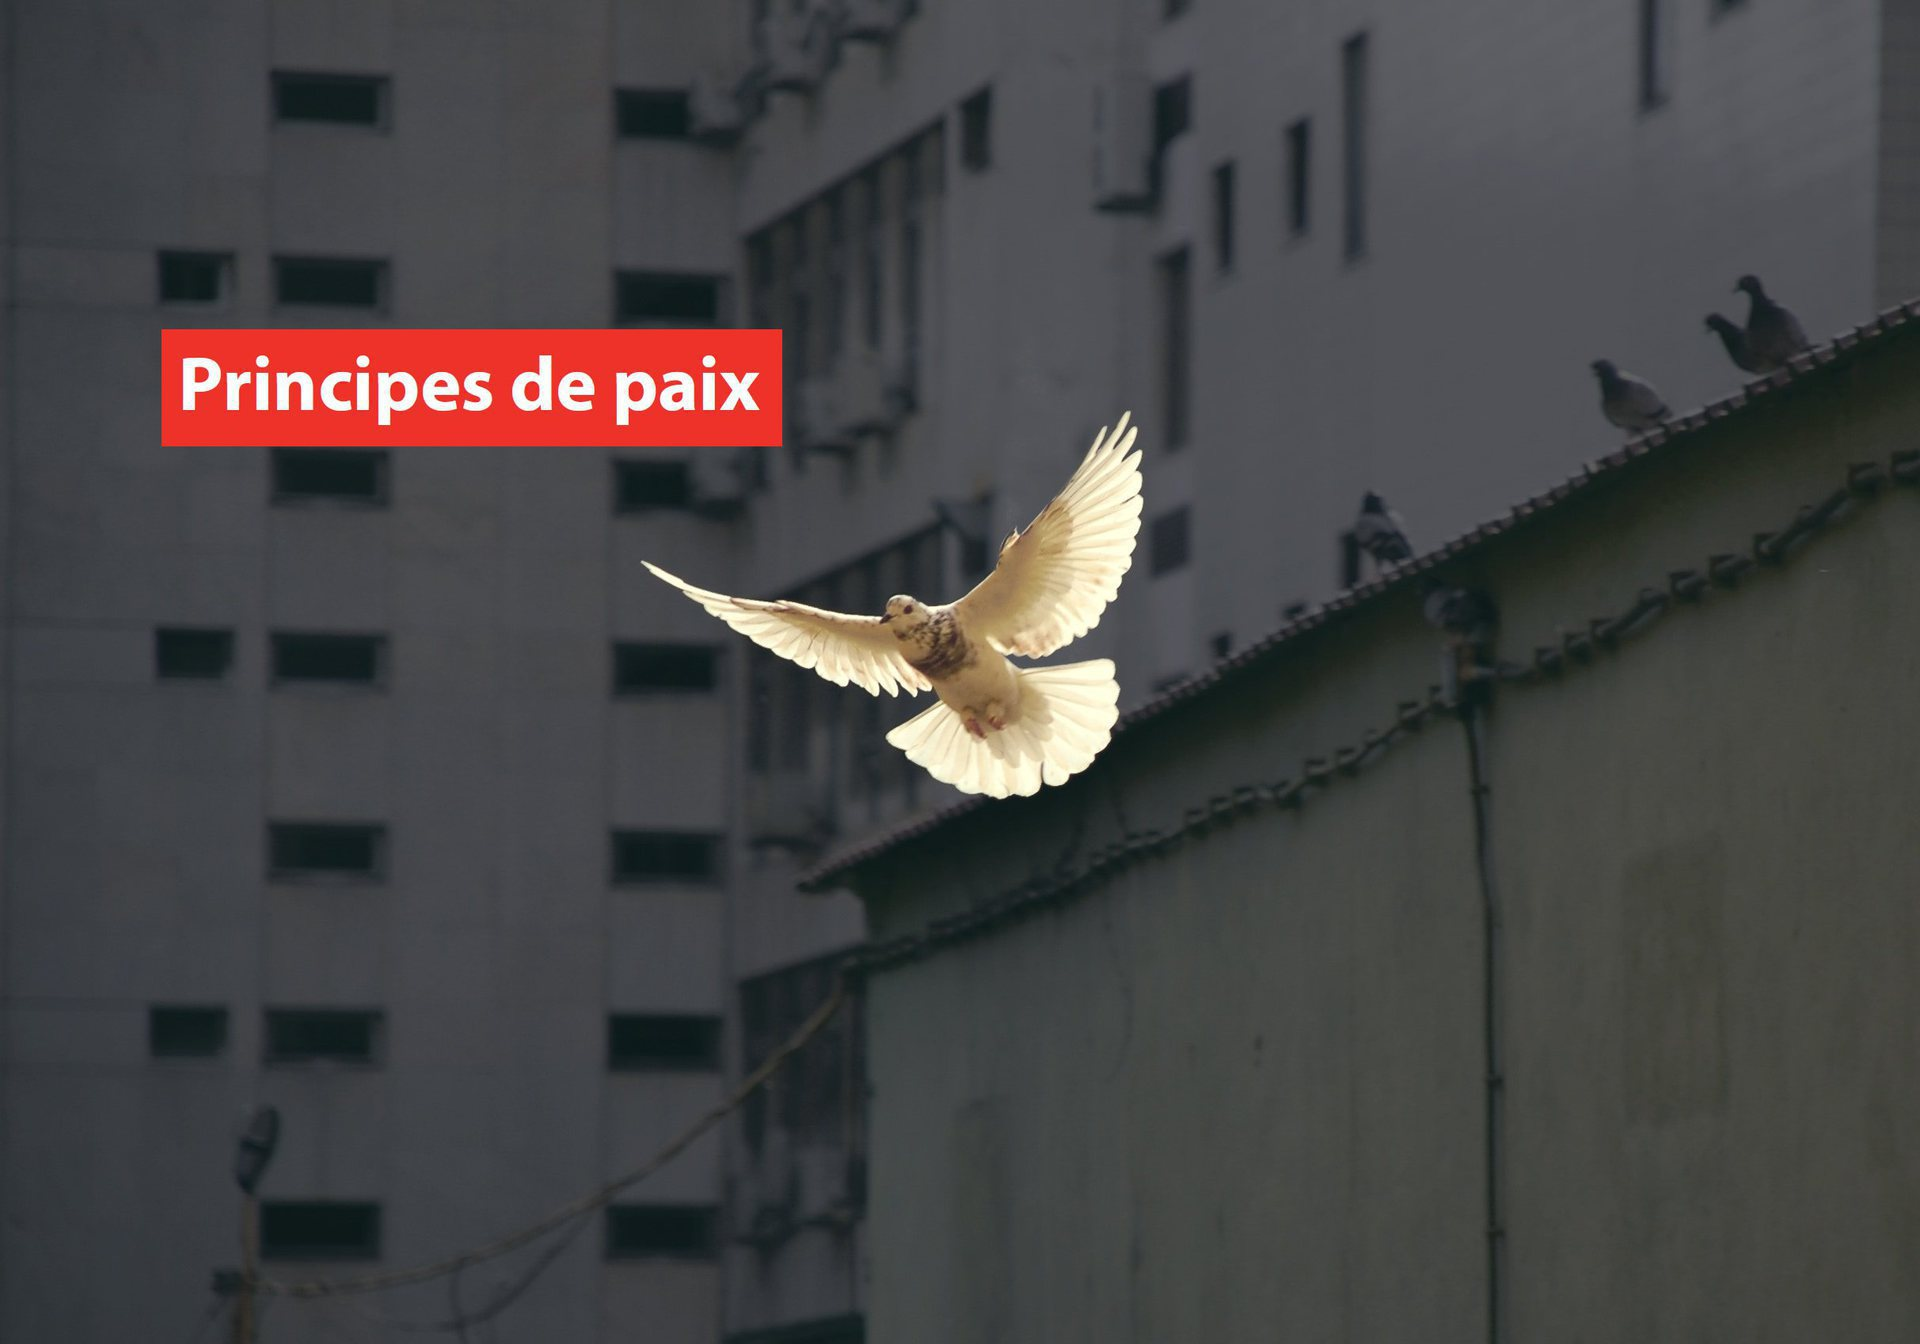 principes-de-paix-image